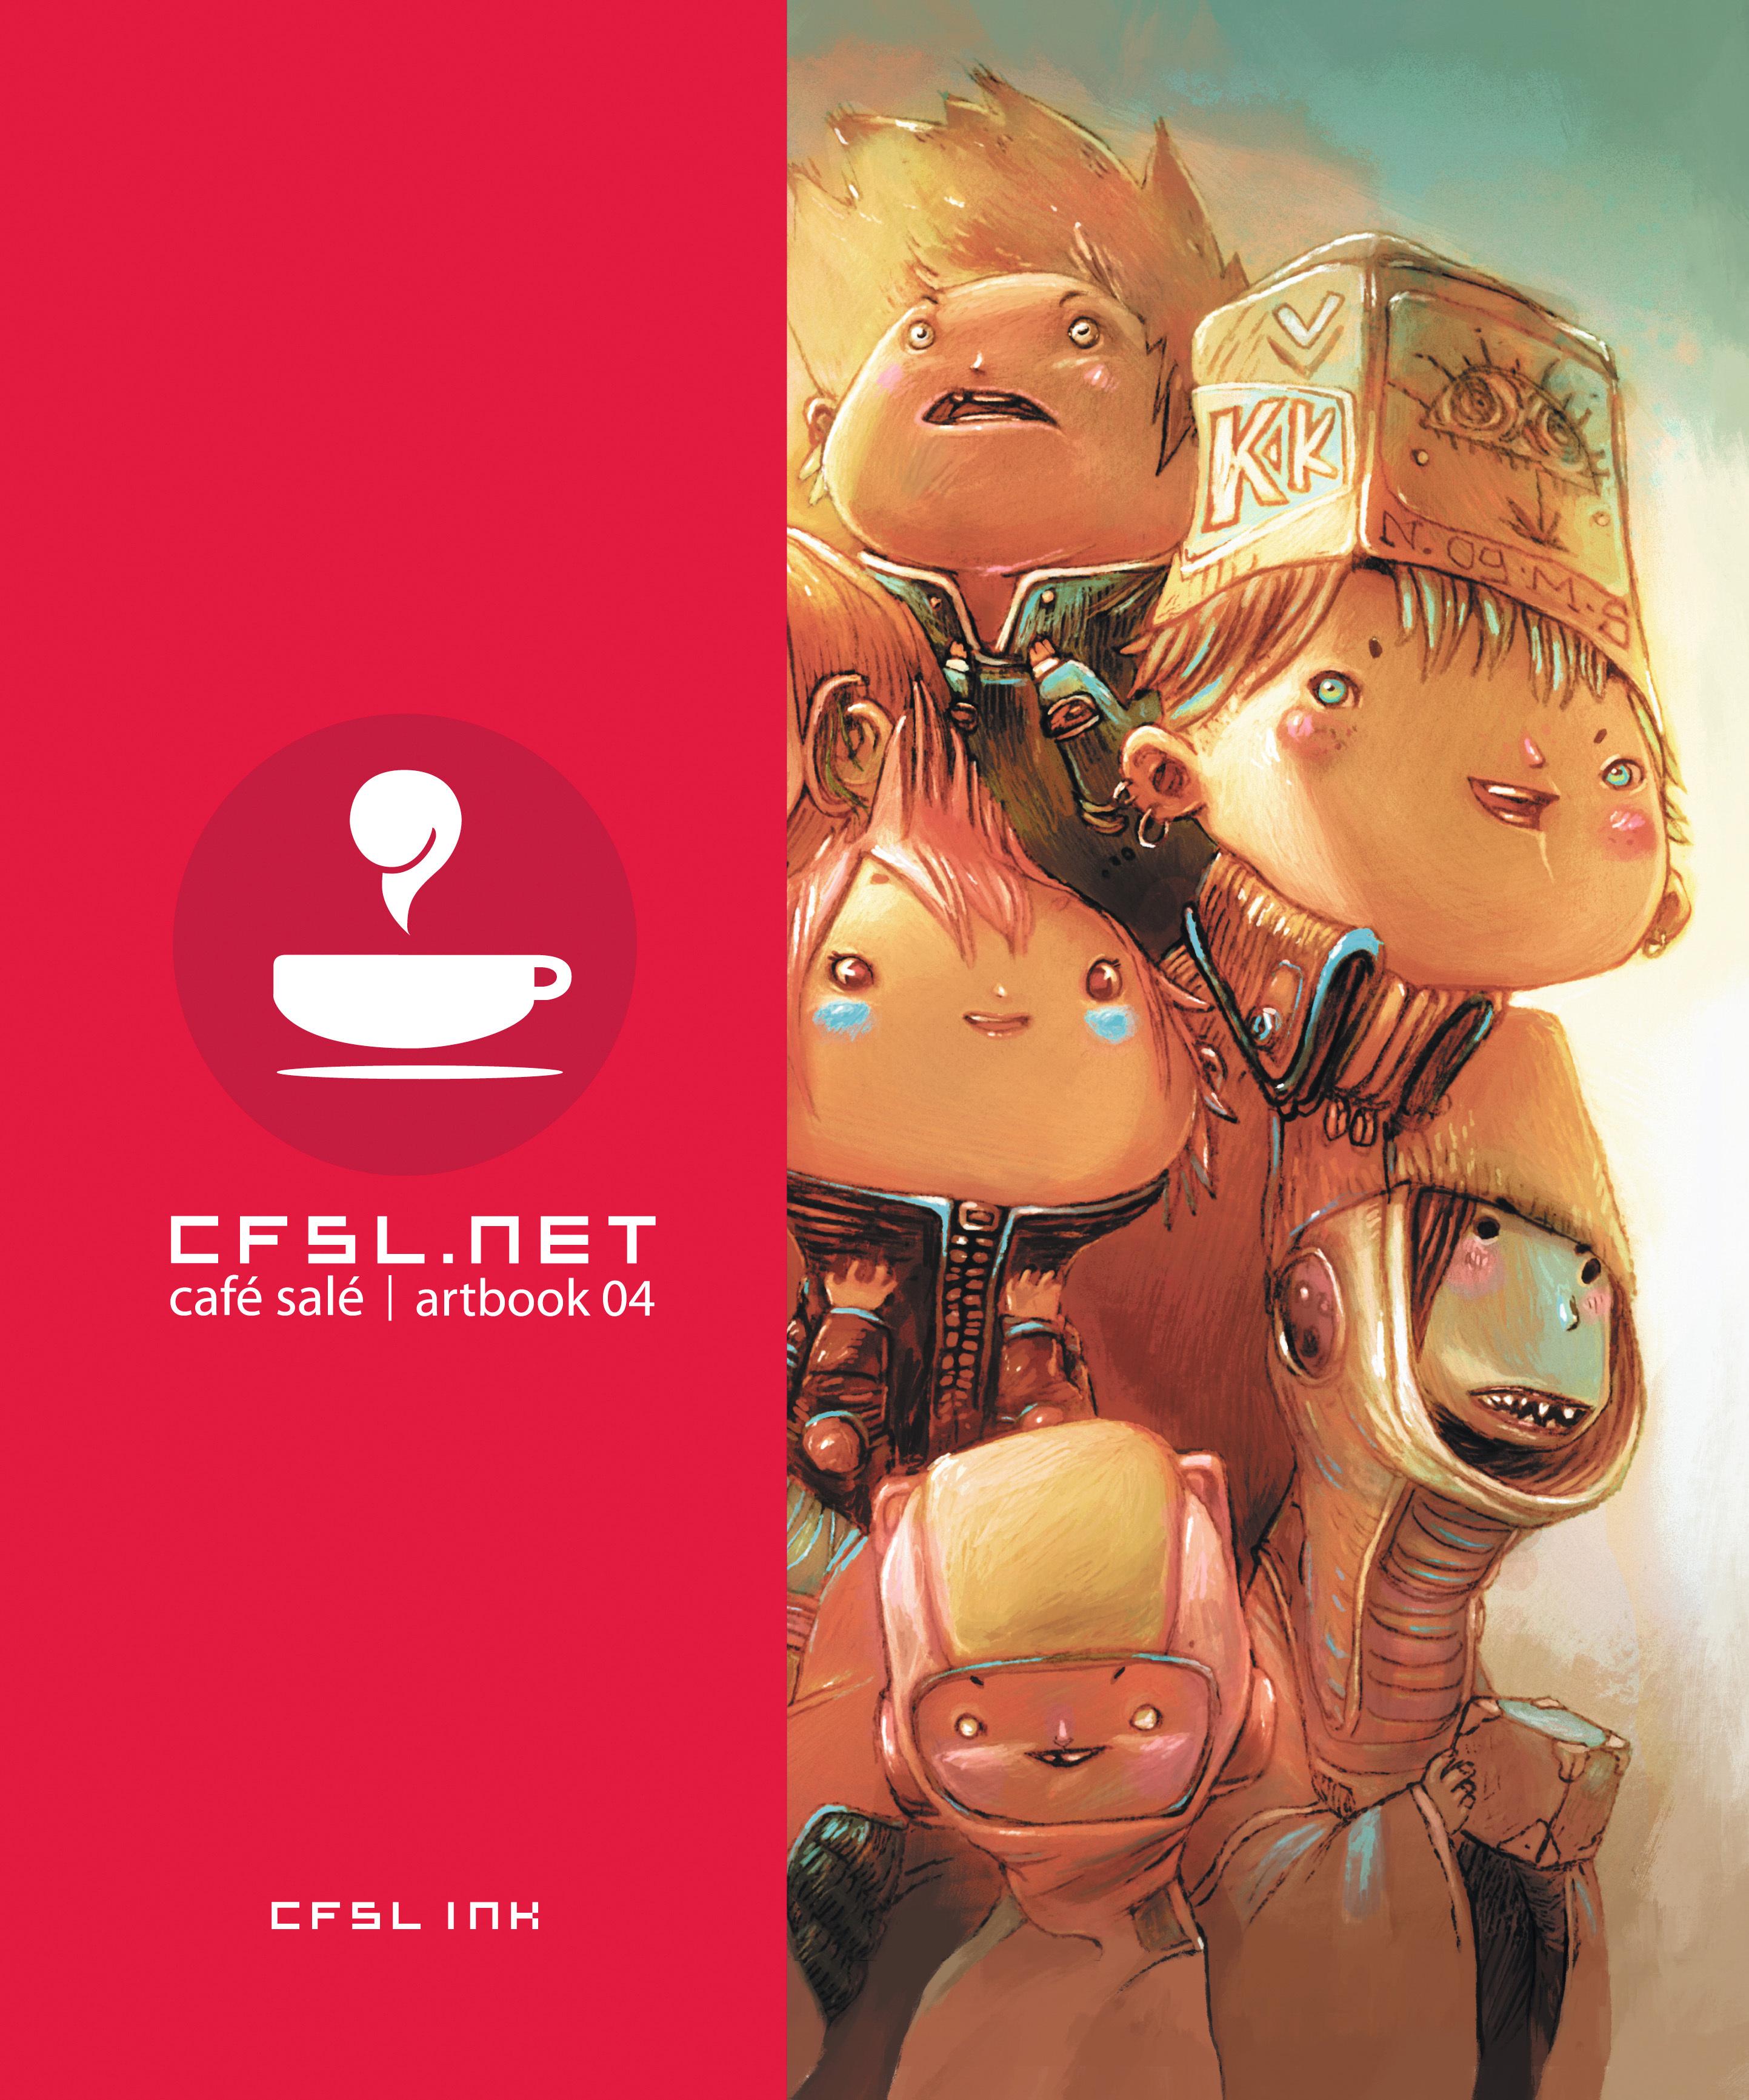 CFSL.NET CAFE SALE ARTBOOK T04